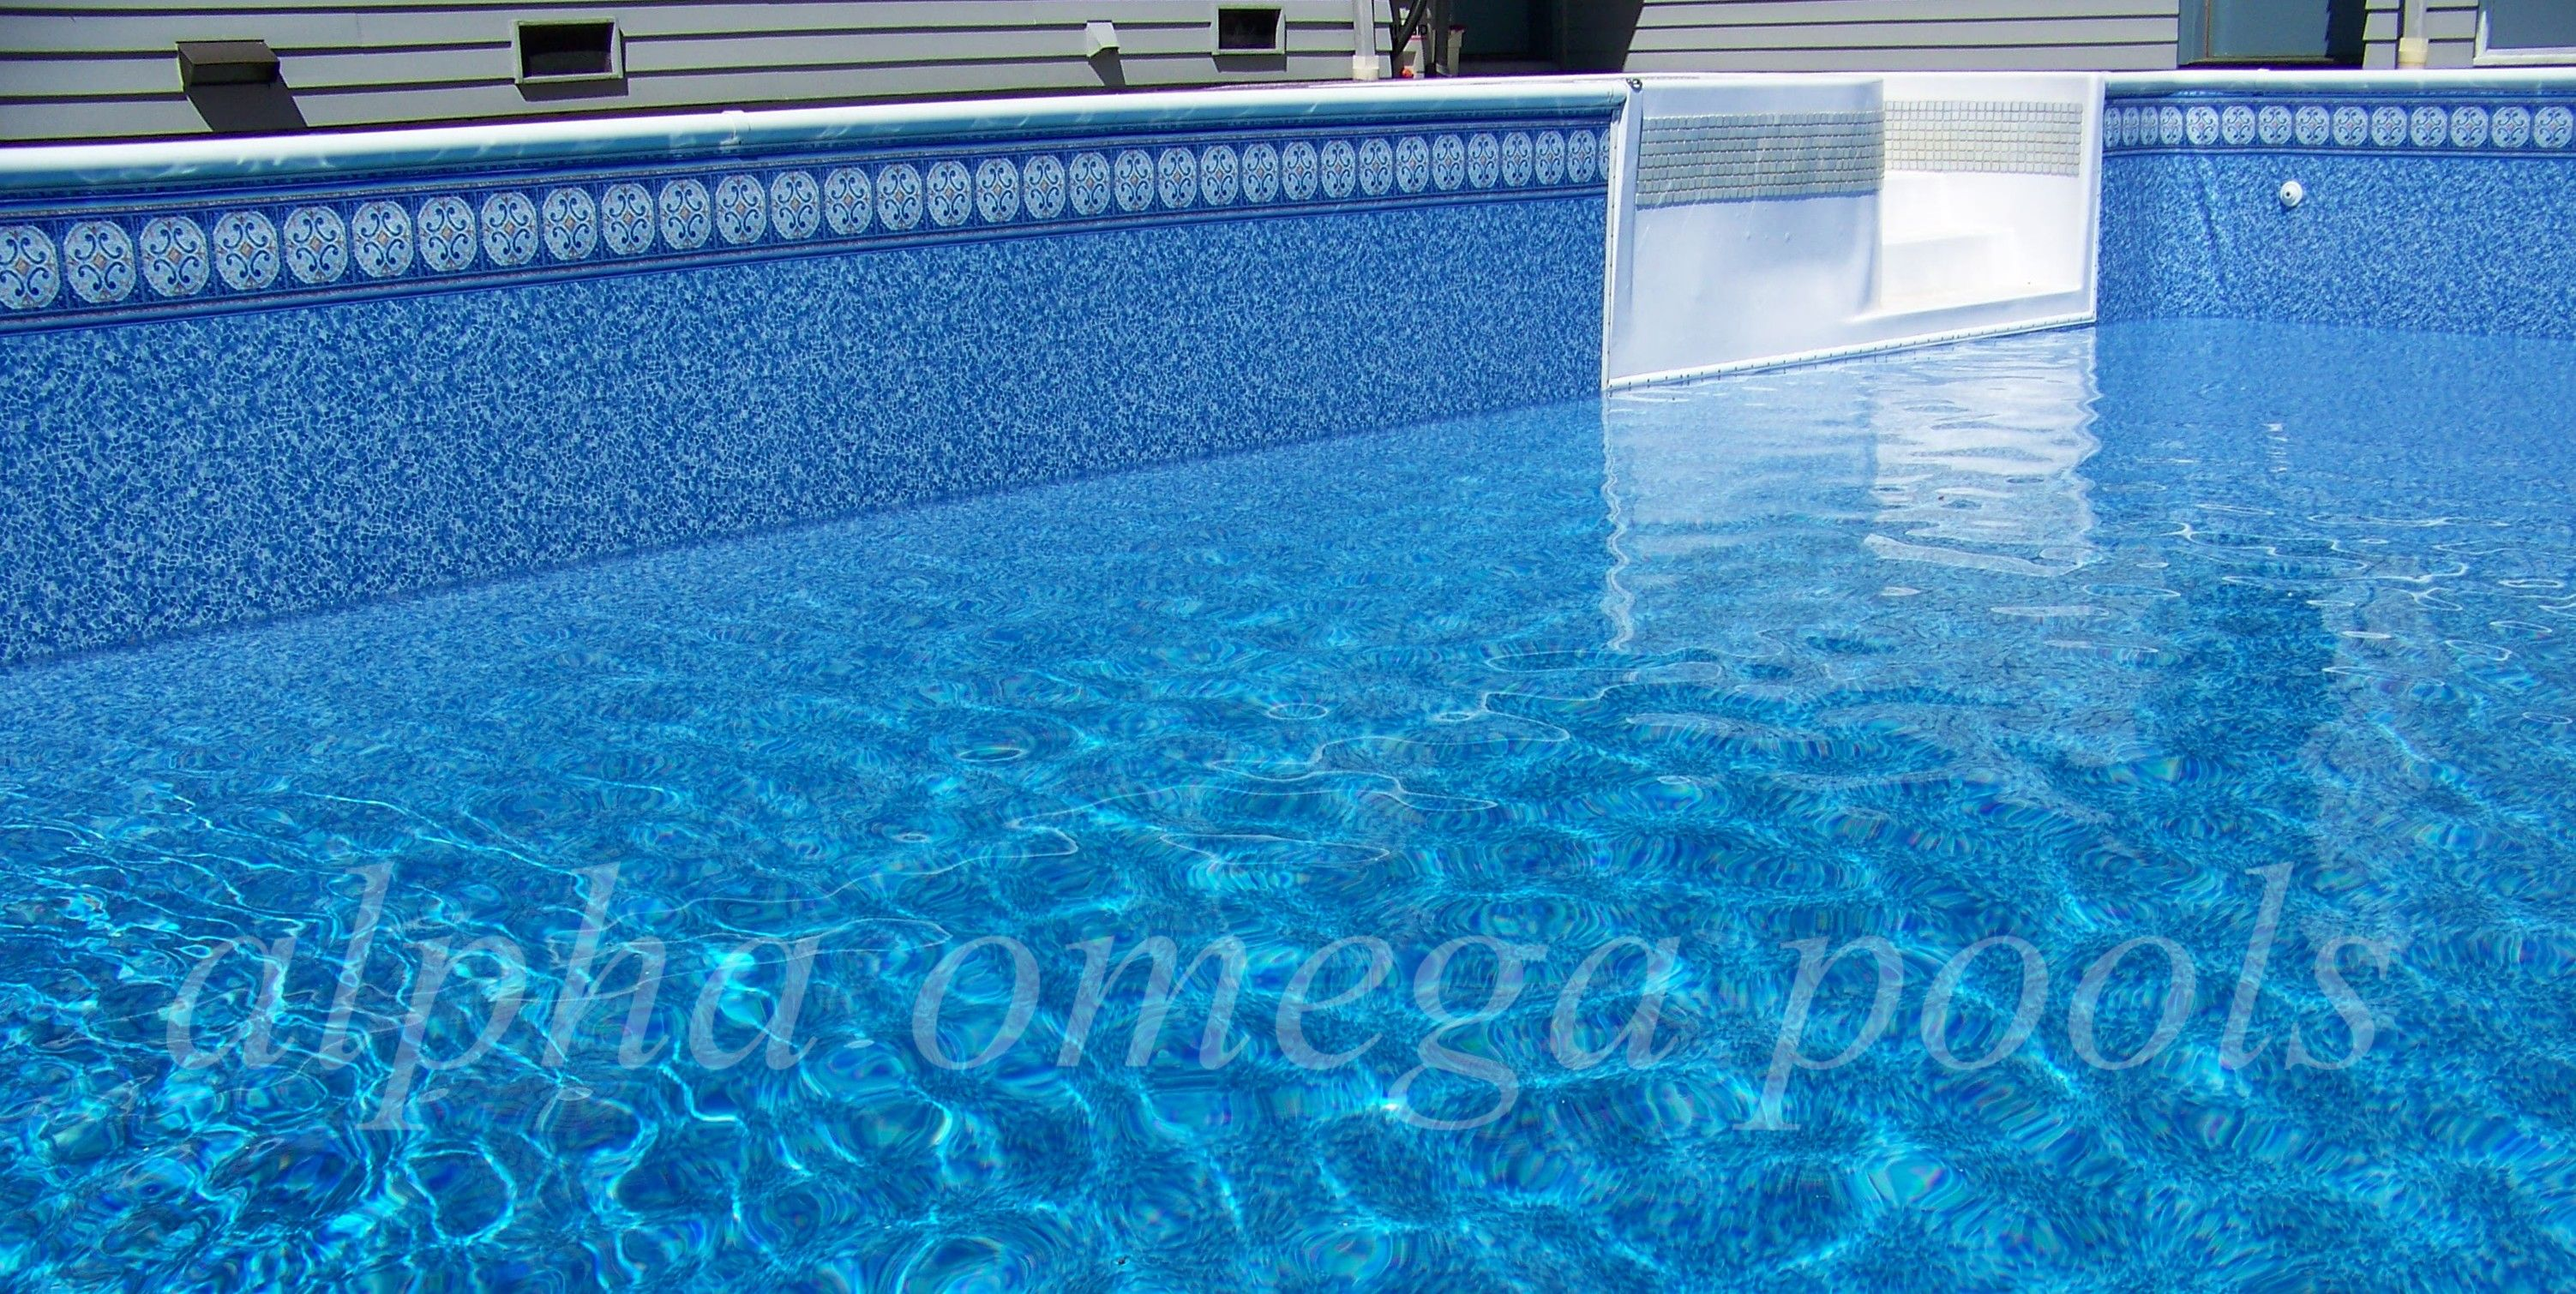 557096f2f529c8502e74b43791d719dc - How To Get Glass Out Of A Vinyl Pool